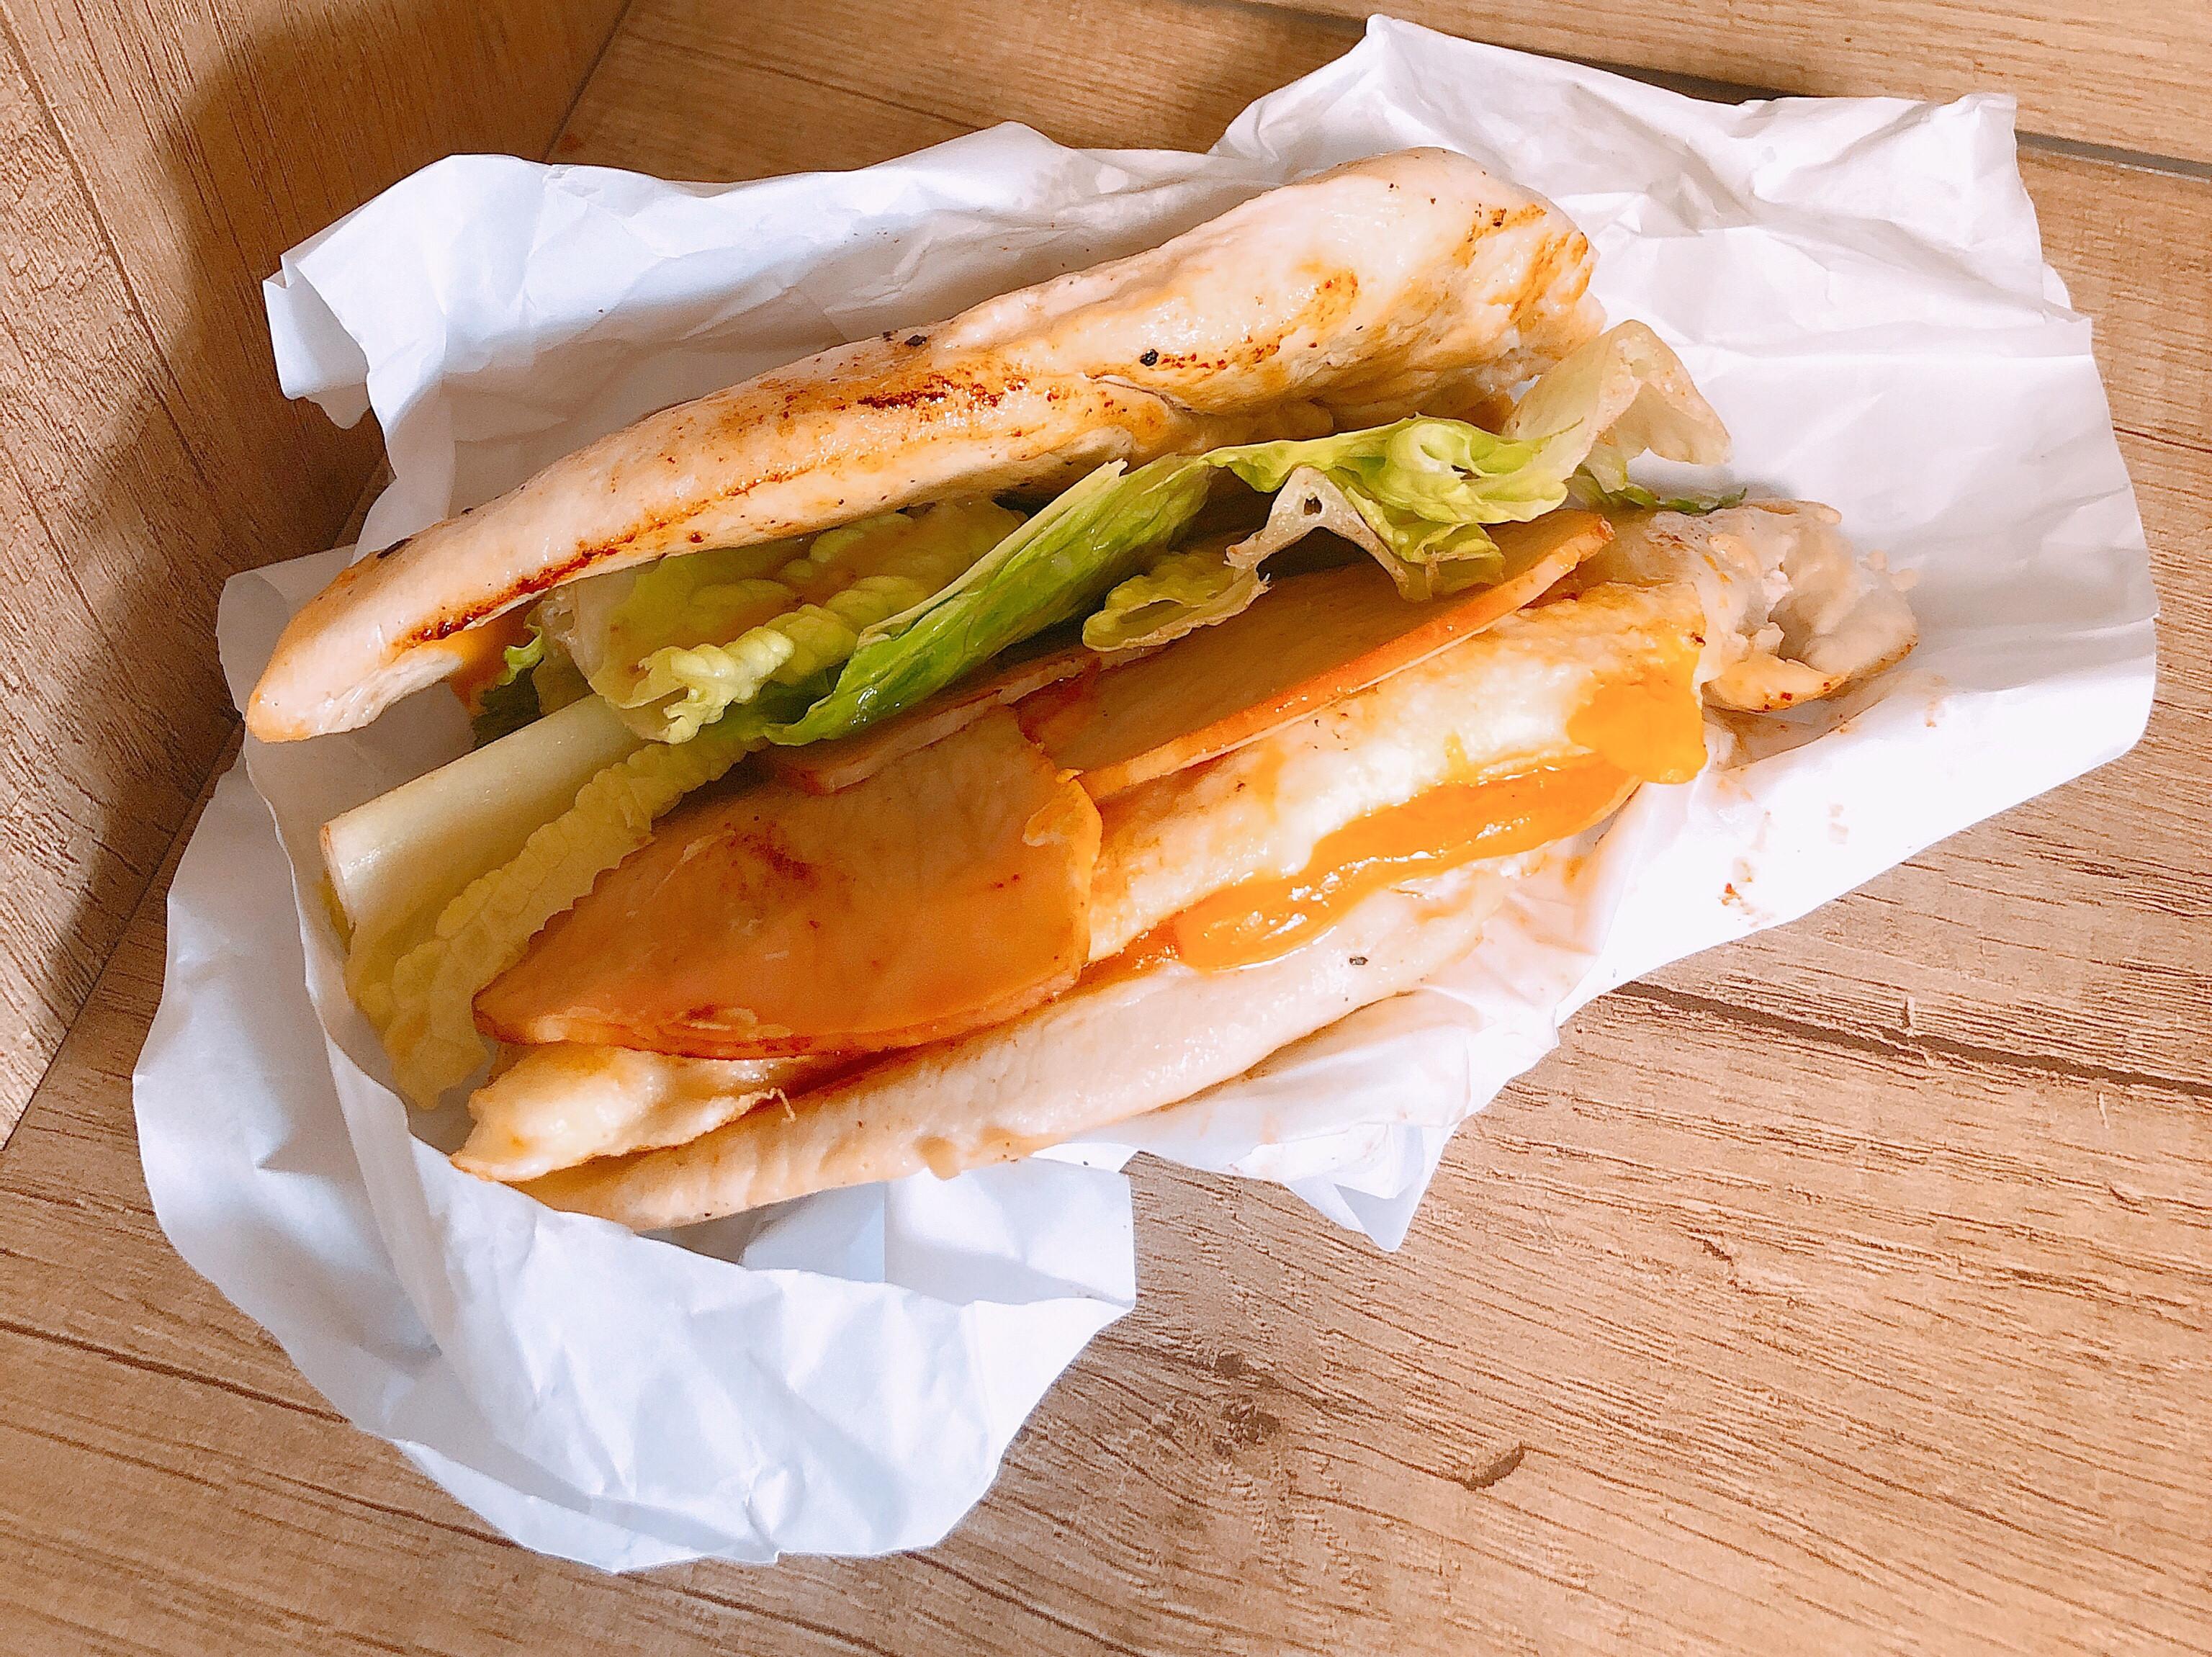 《80g蛋白質》超低碳水-雞胸肉漢堡